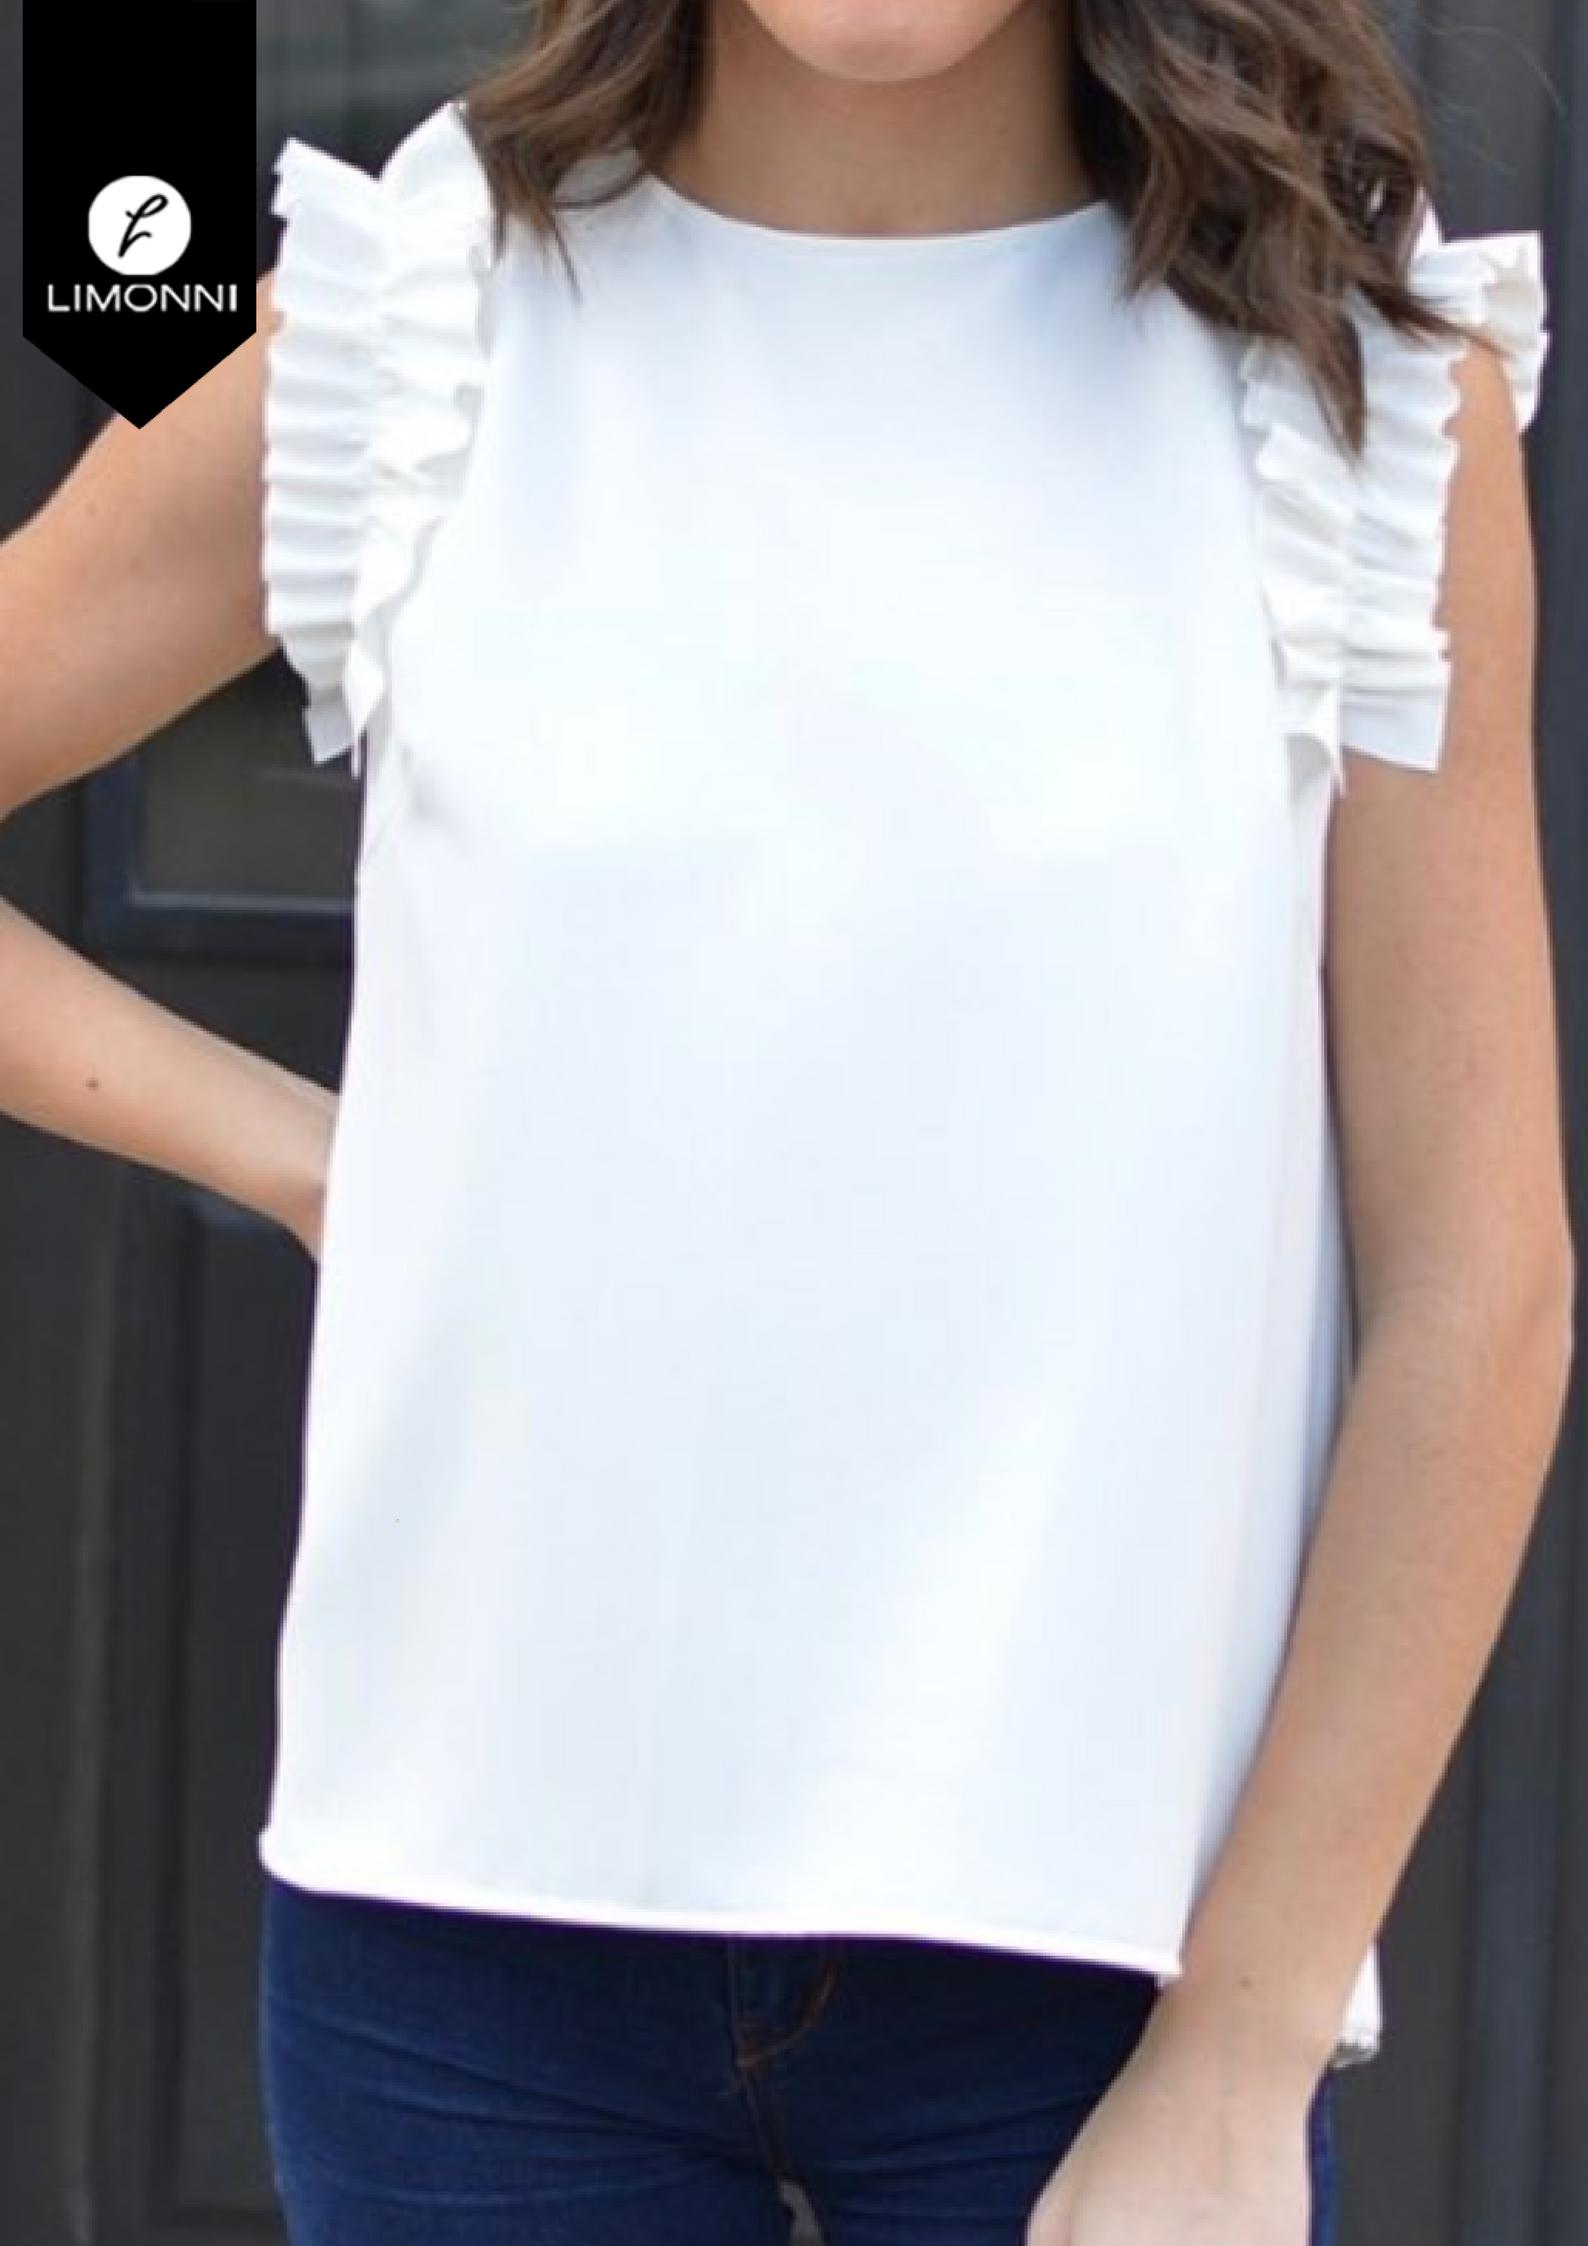 Blusas para mujer Limonni Bennett LI1292 Casuales